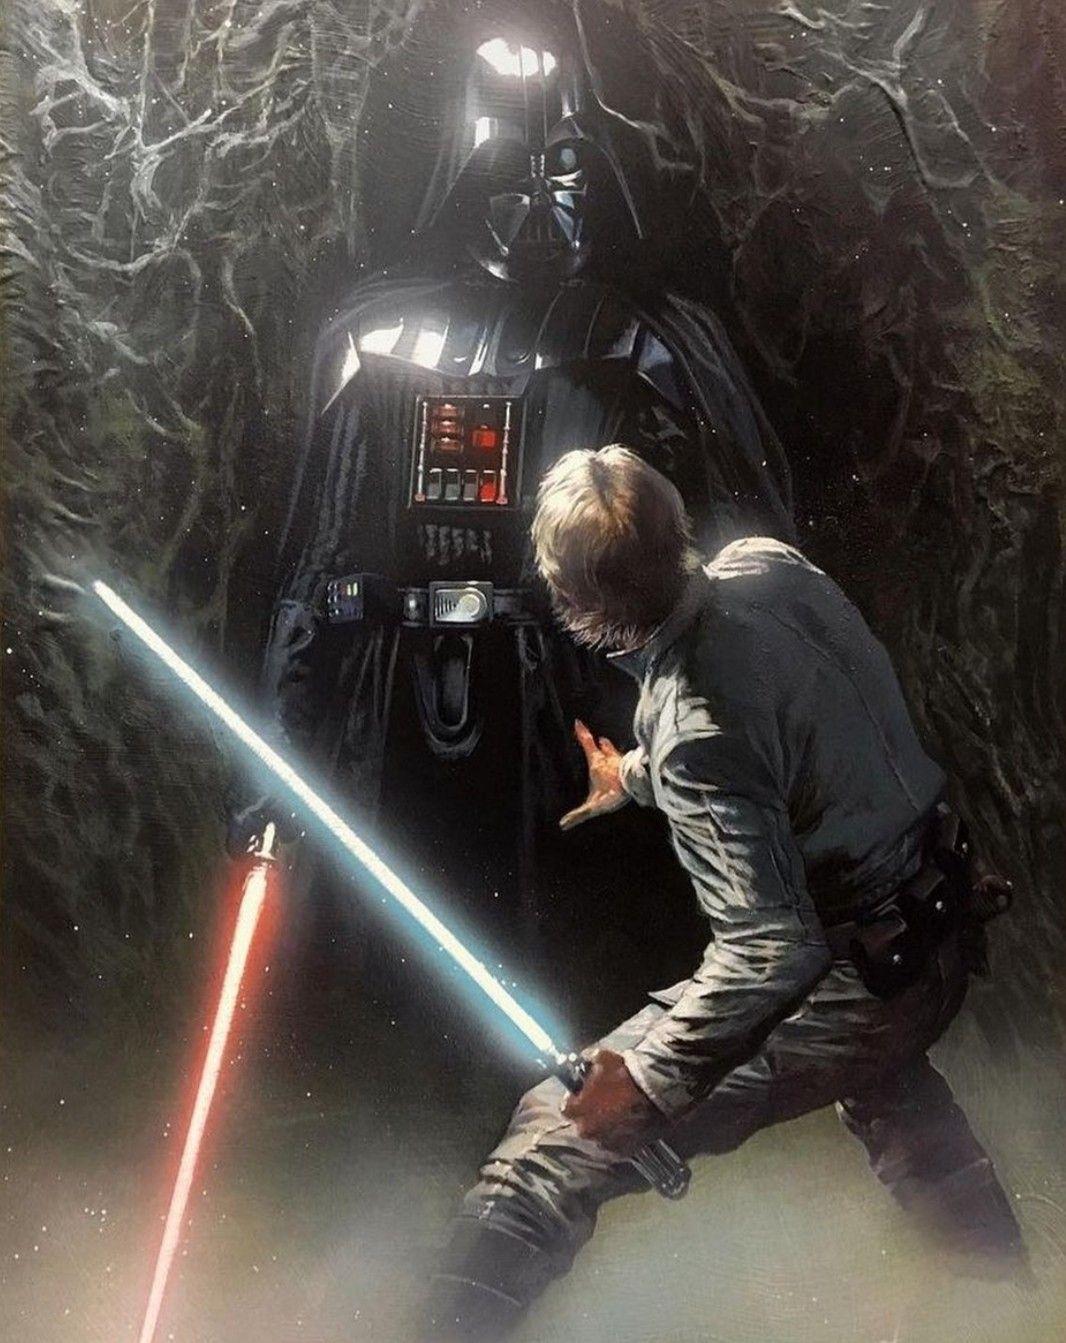 Luke Skywalker Vs Darth Vader In Degobah Darth Vader Vader Star